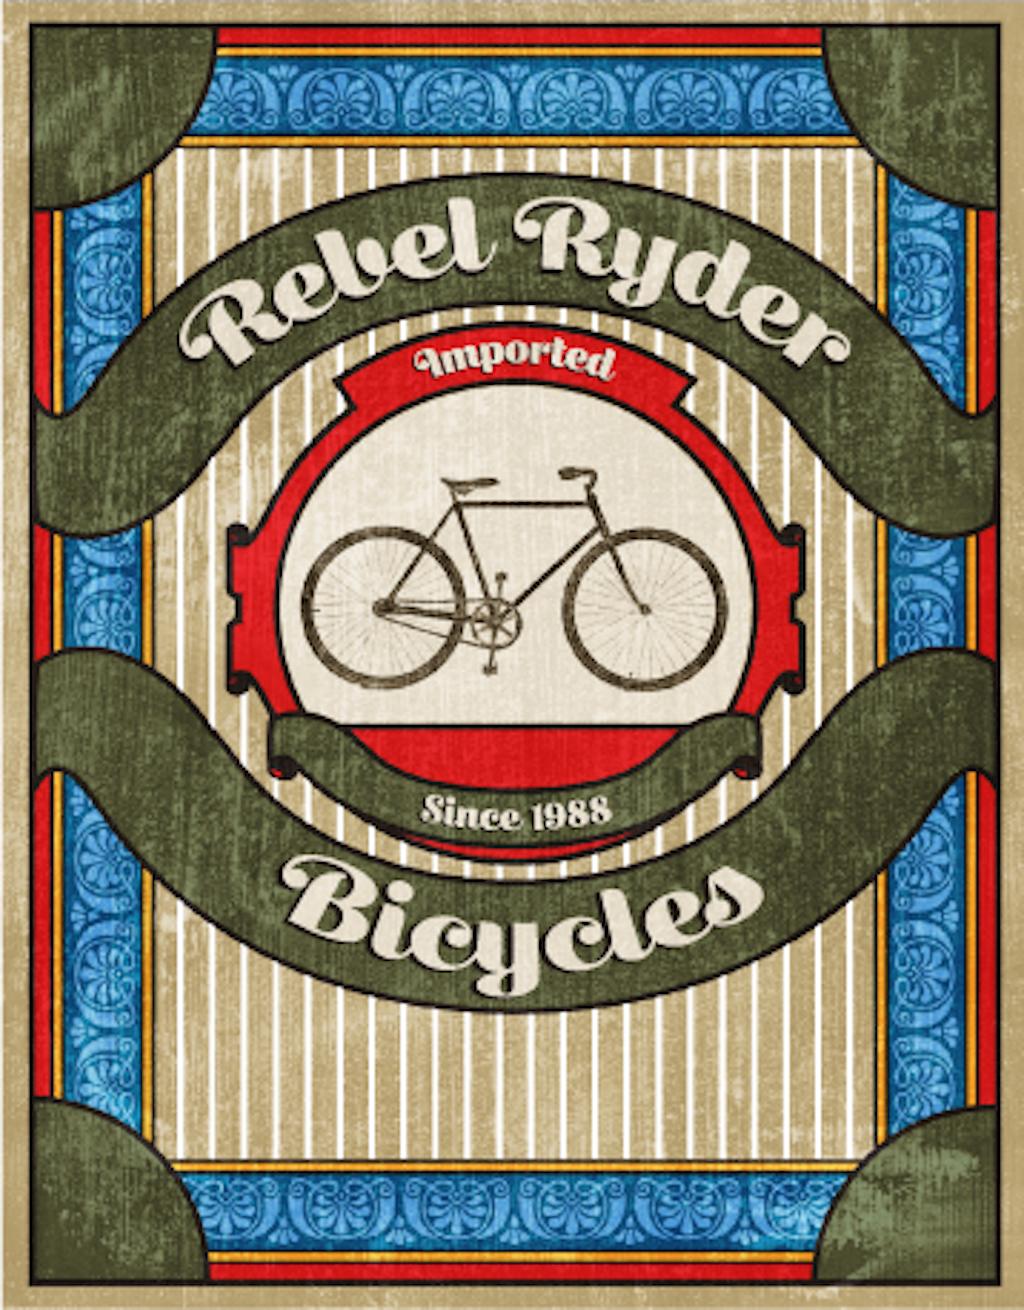 Rebel Ryder Bicycles, SCAD, 2014